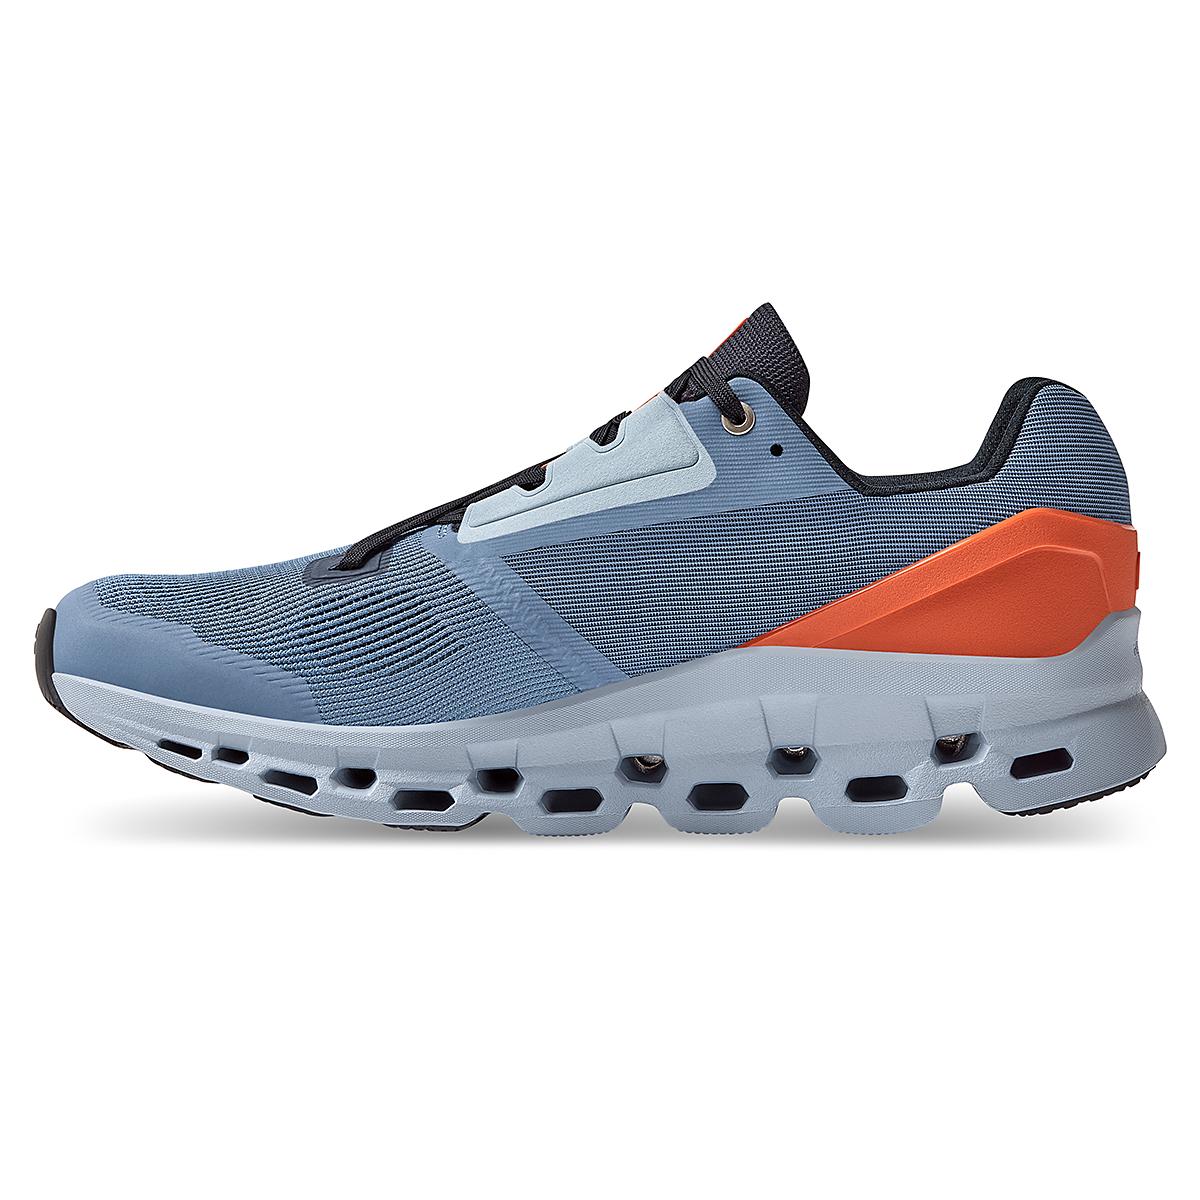 Men's On Cloudstratus 2.0 Running Shoe - Color: Lake/Flare - Size: 7 - Width: Regular, Lake/Flare, large, image 3